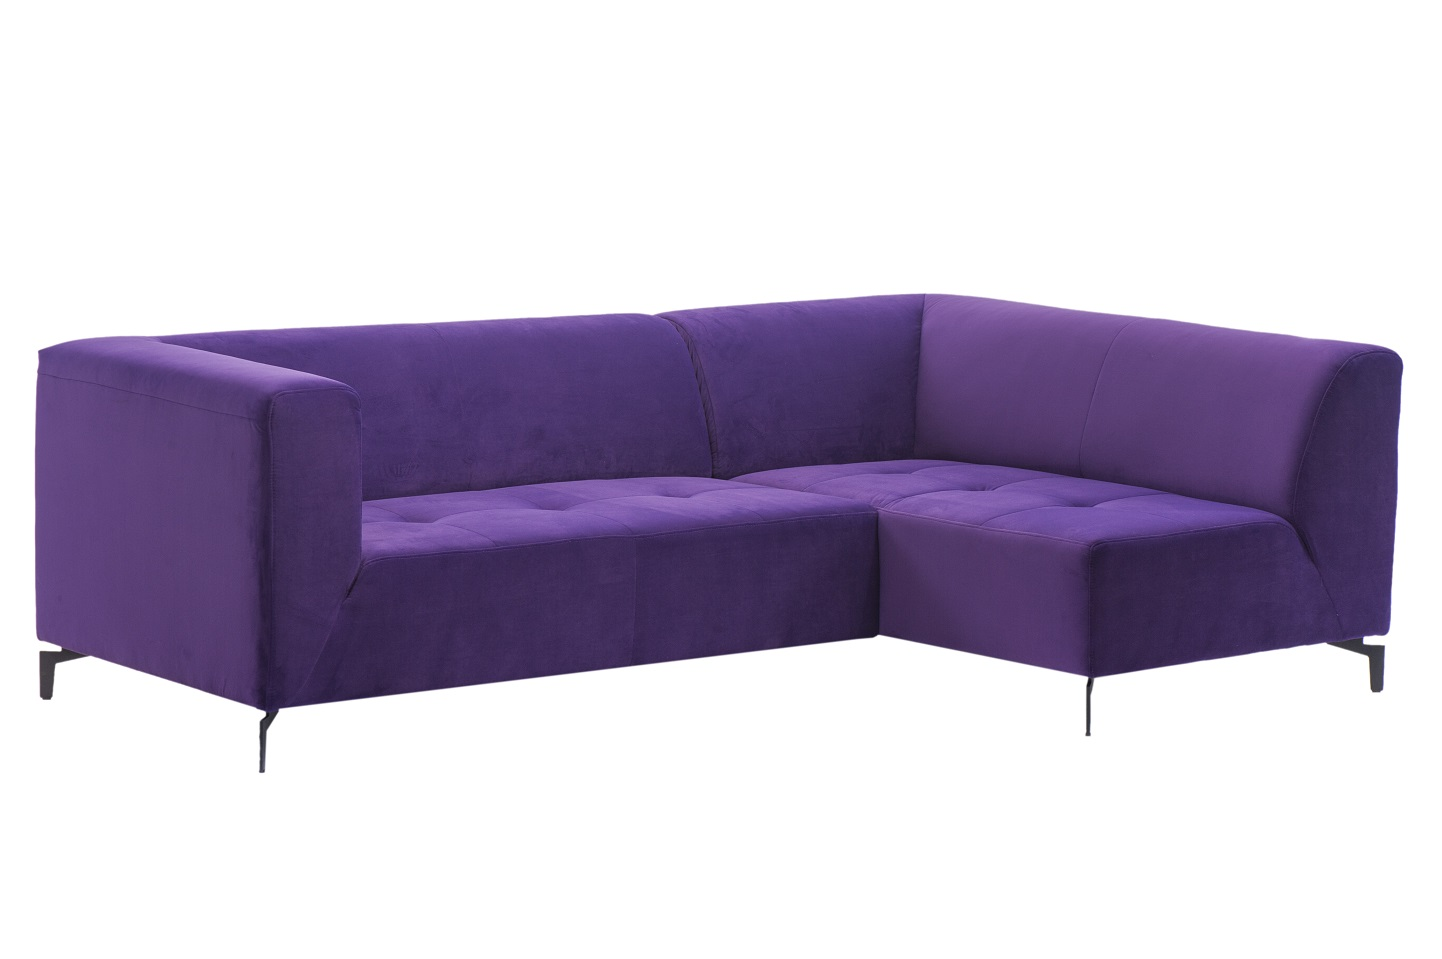 nowoczesna sofa moderno maduu studio ideal design